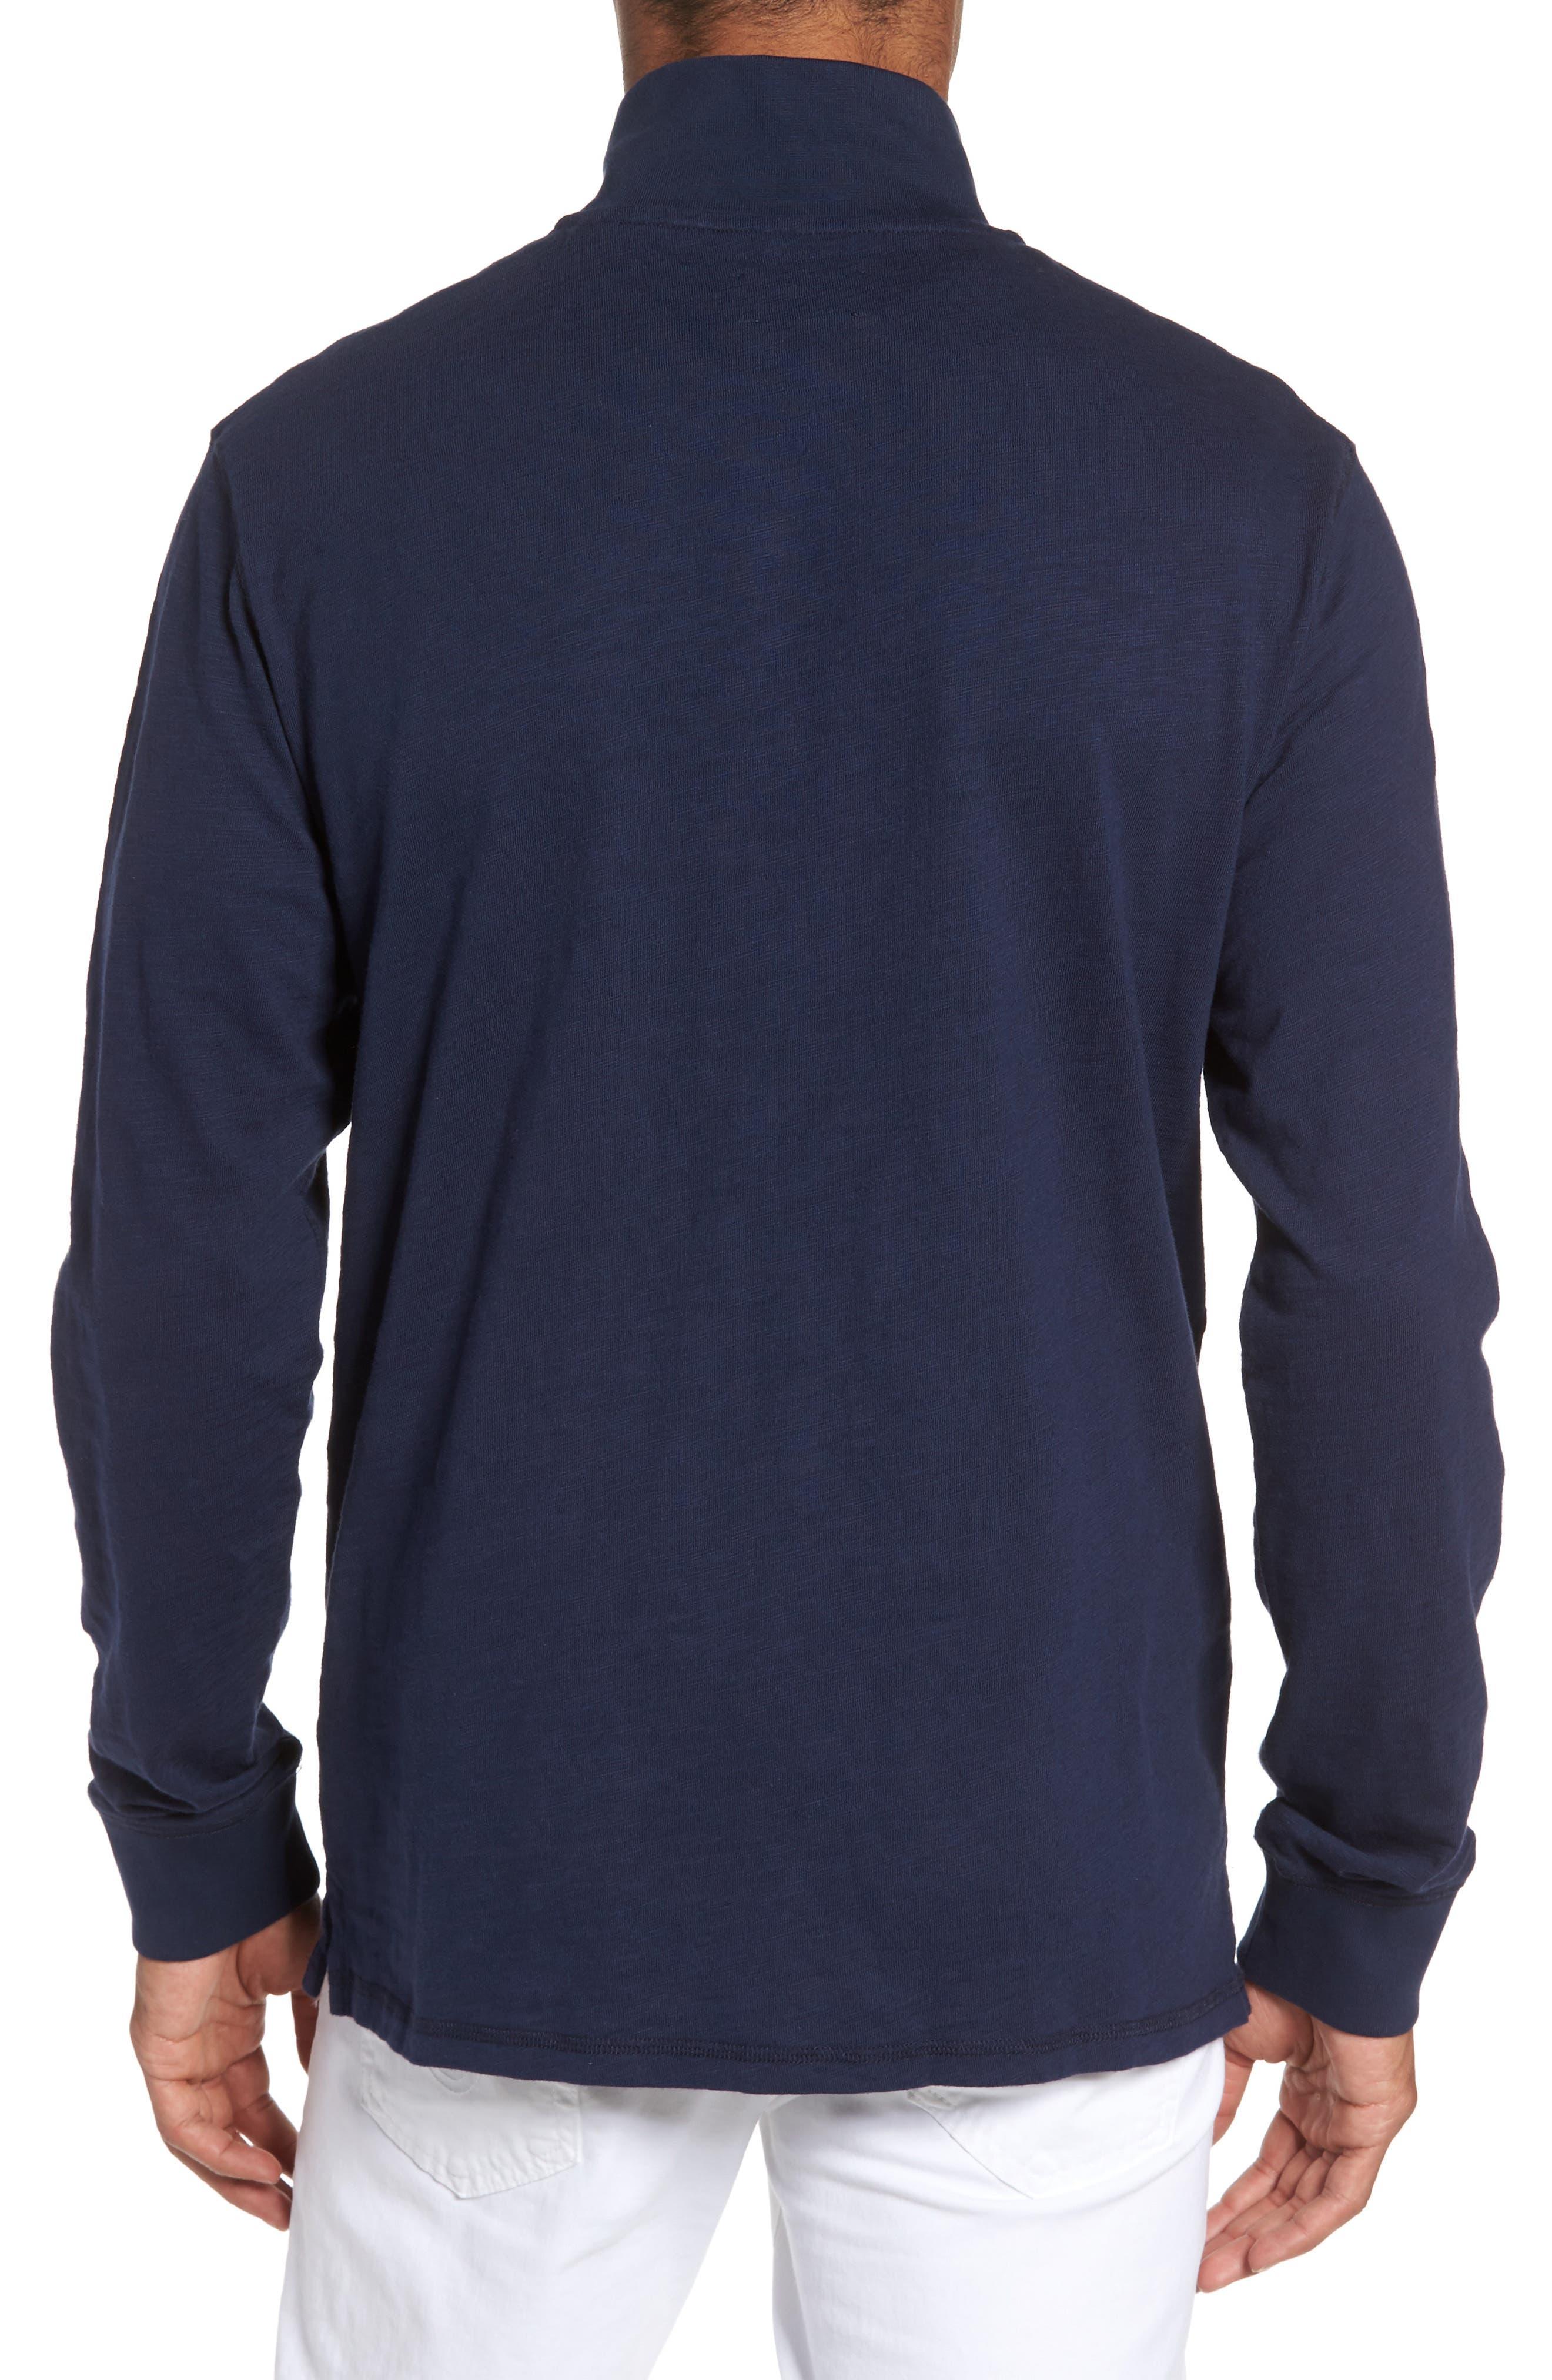 Gulf Stream Sweatshirt,                             Alternate thumbnail 2, color,                             408